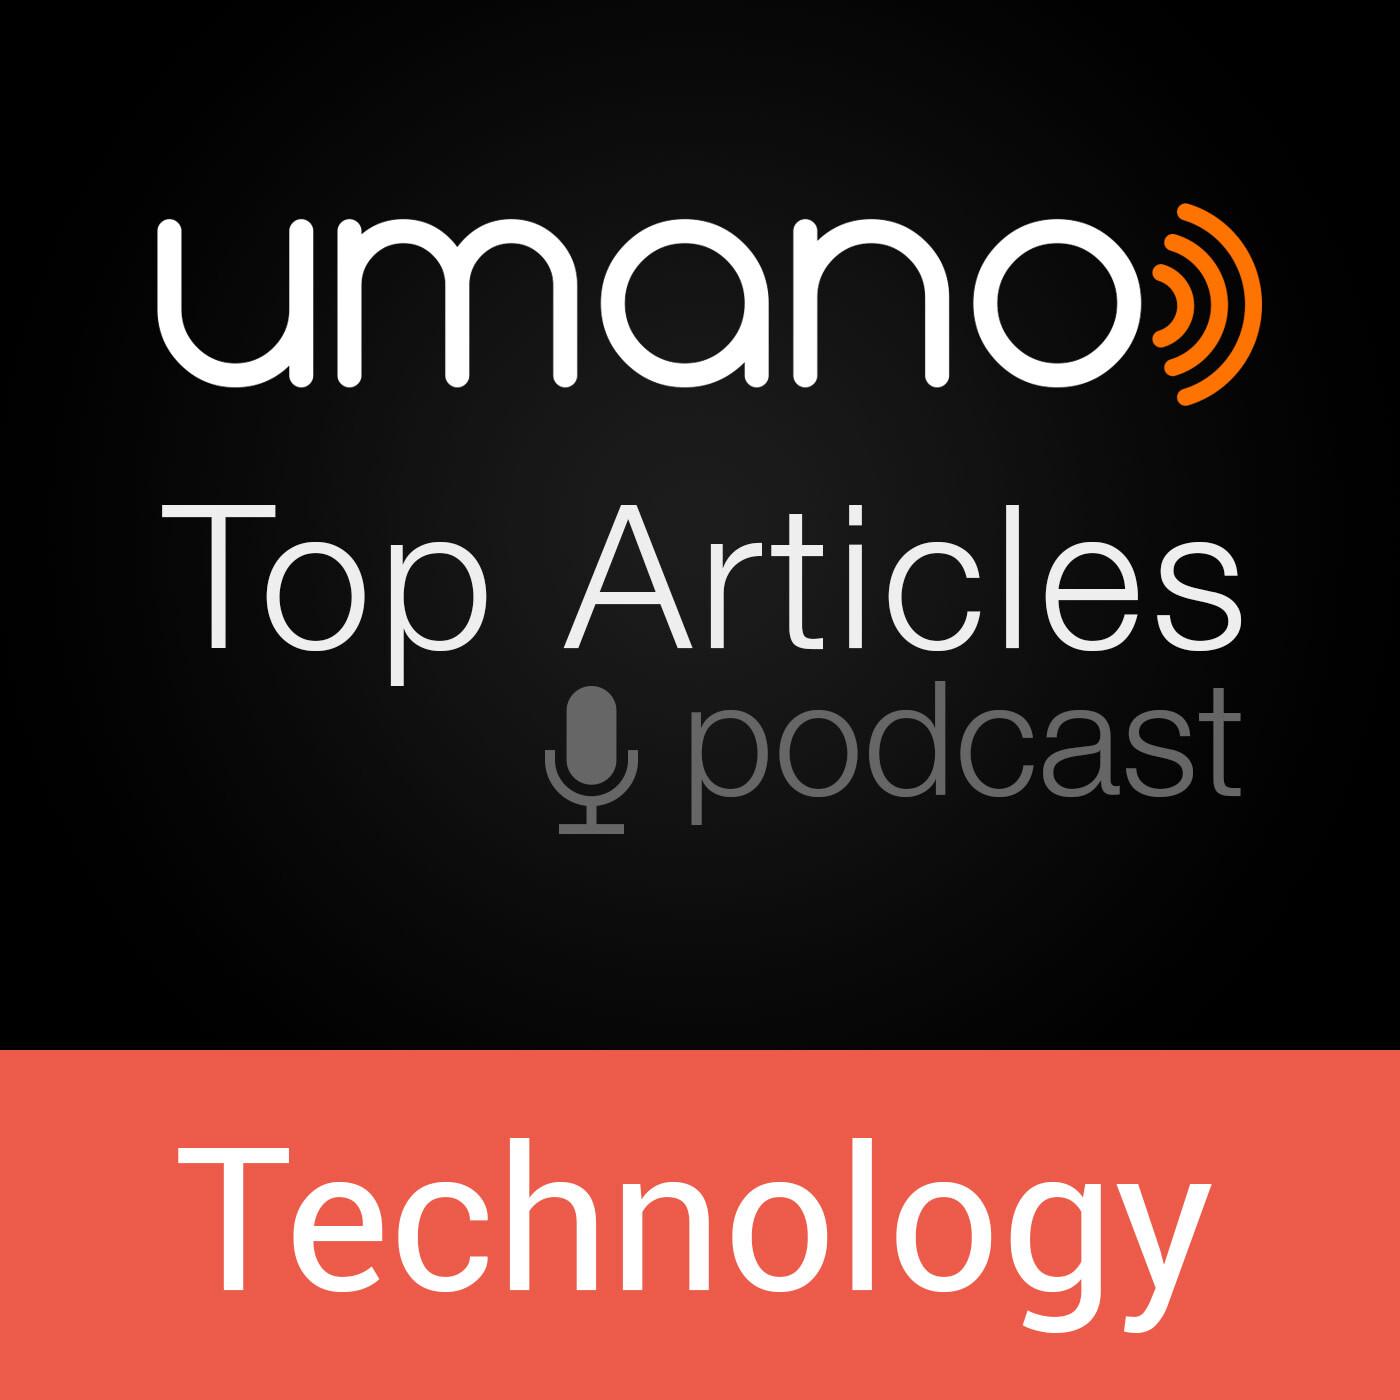 Ep 26: TechCrunch - Is Some Tech Too Addictive? | VentureBeat - Apple Announces